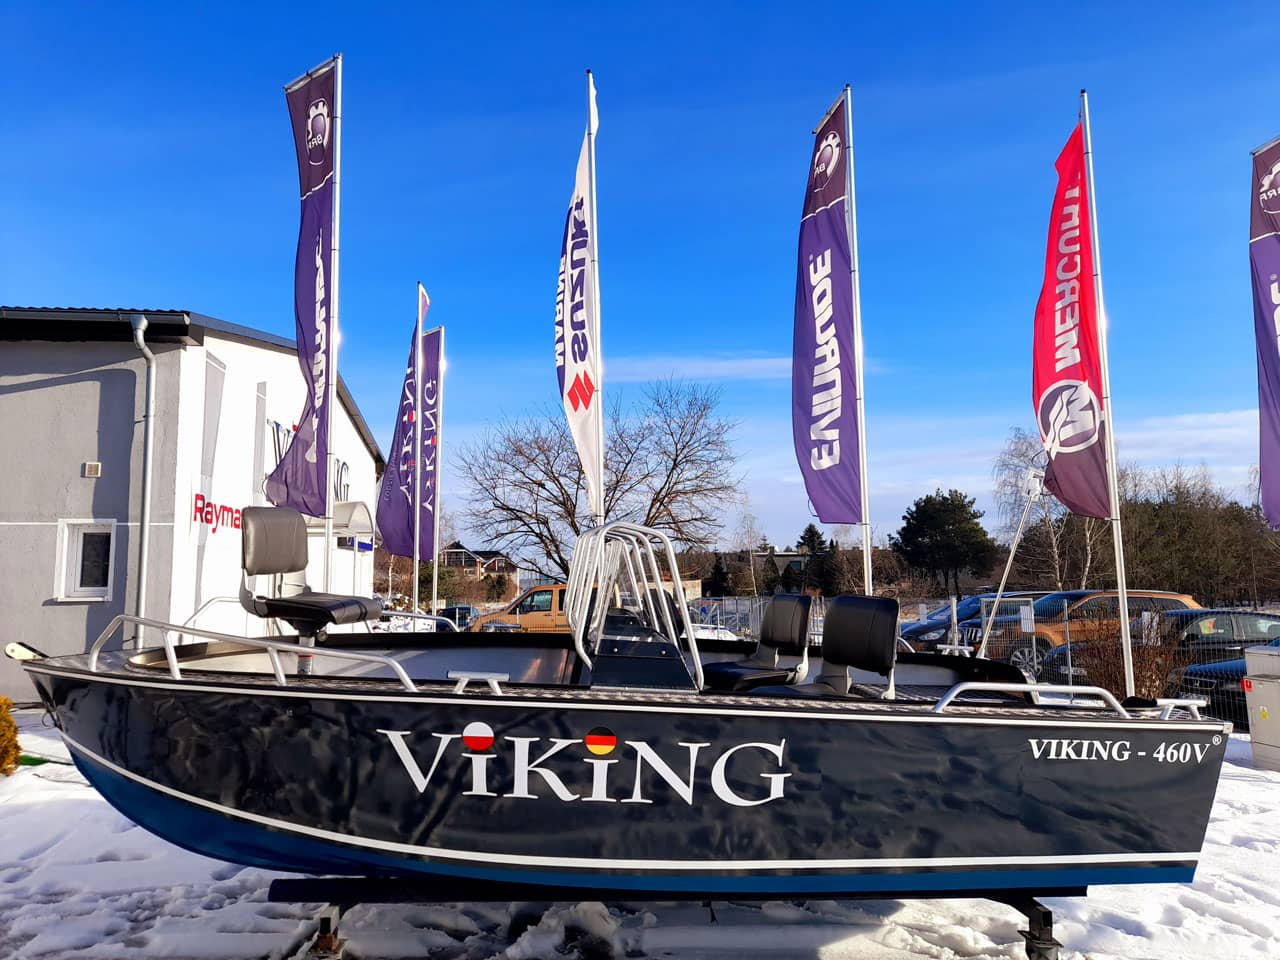 Viking 460v Zima